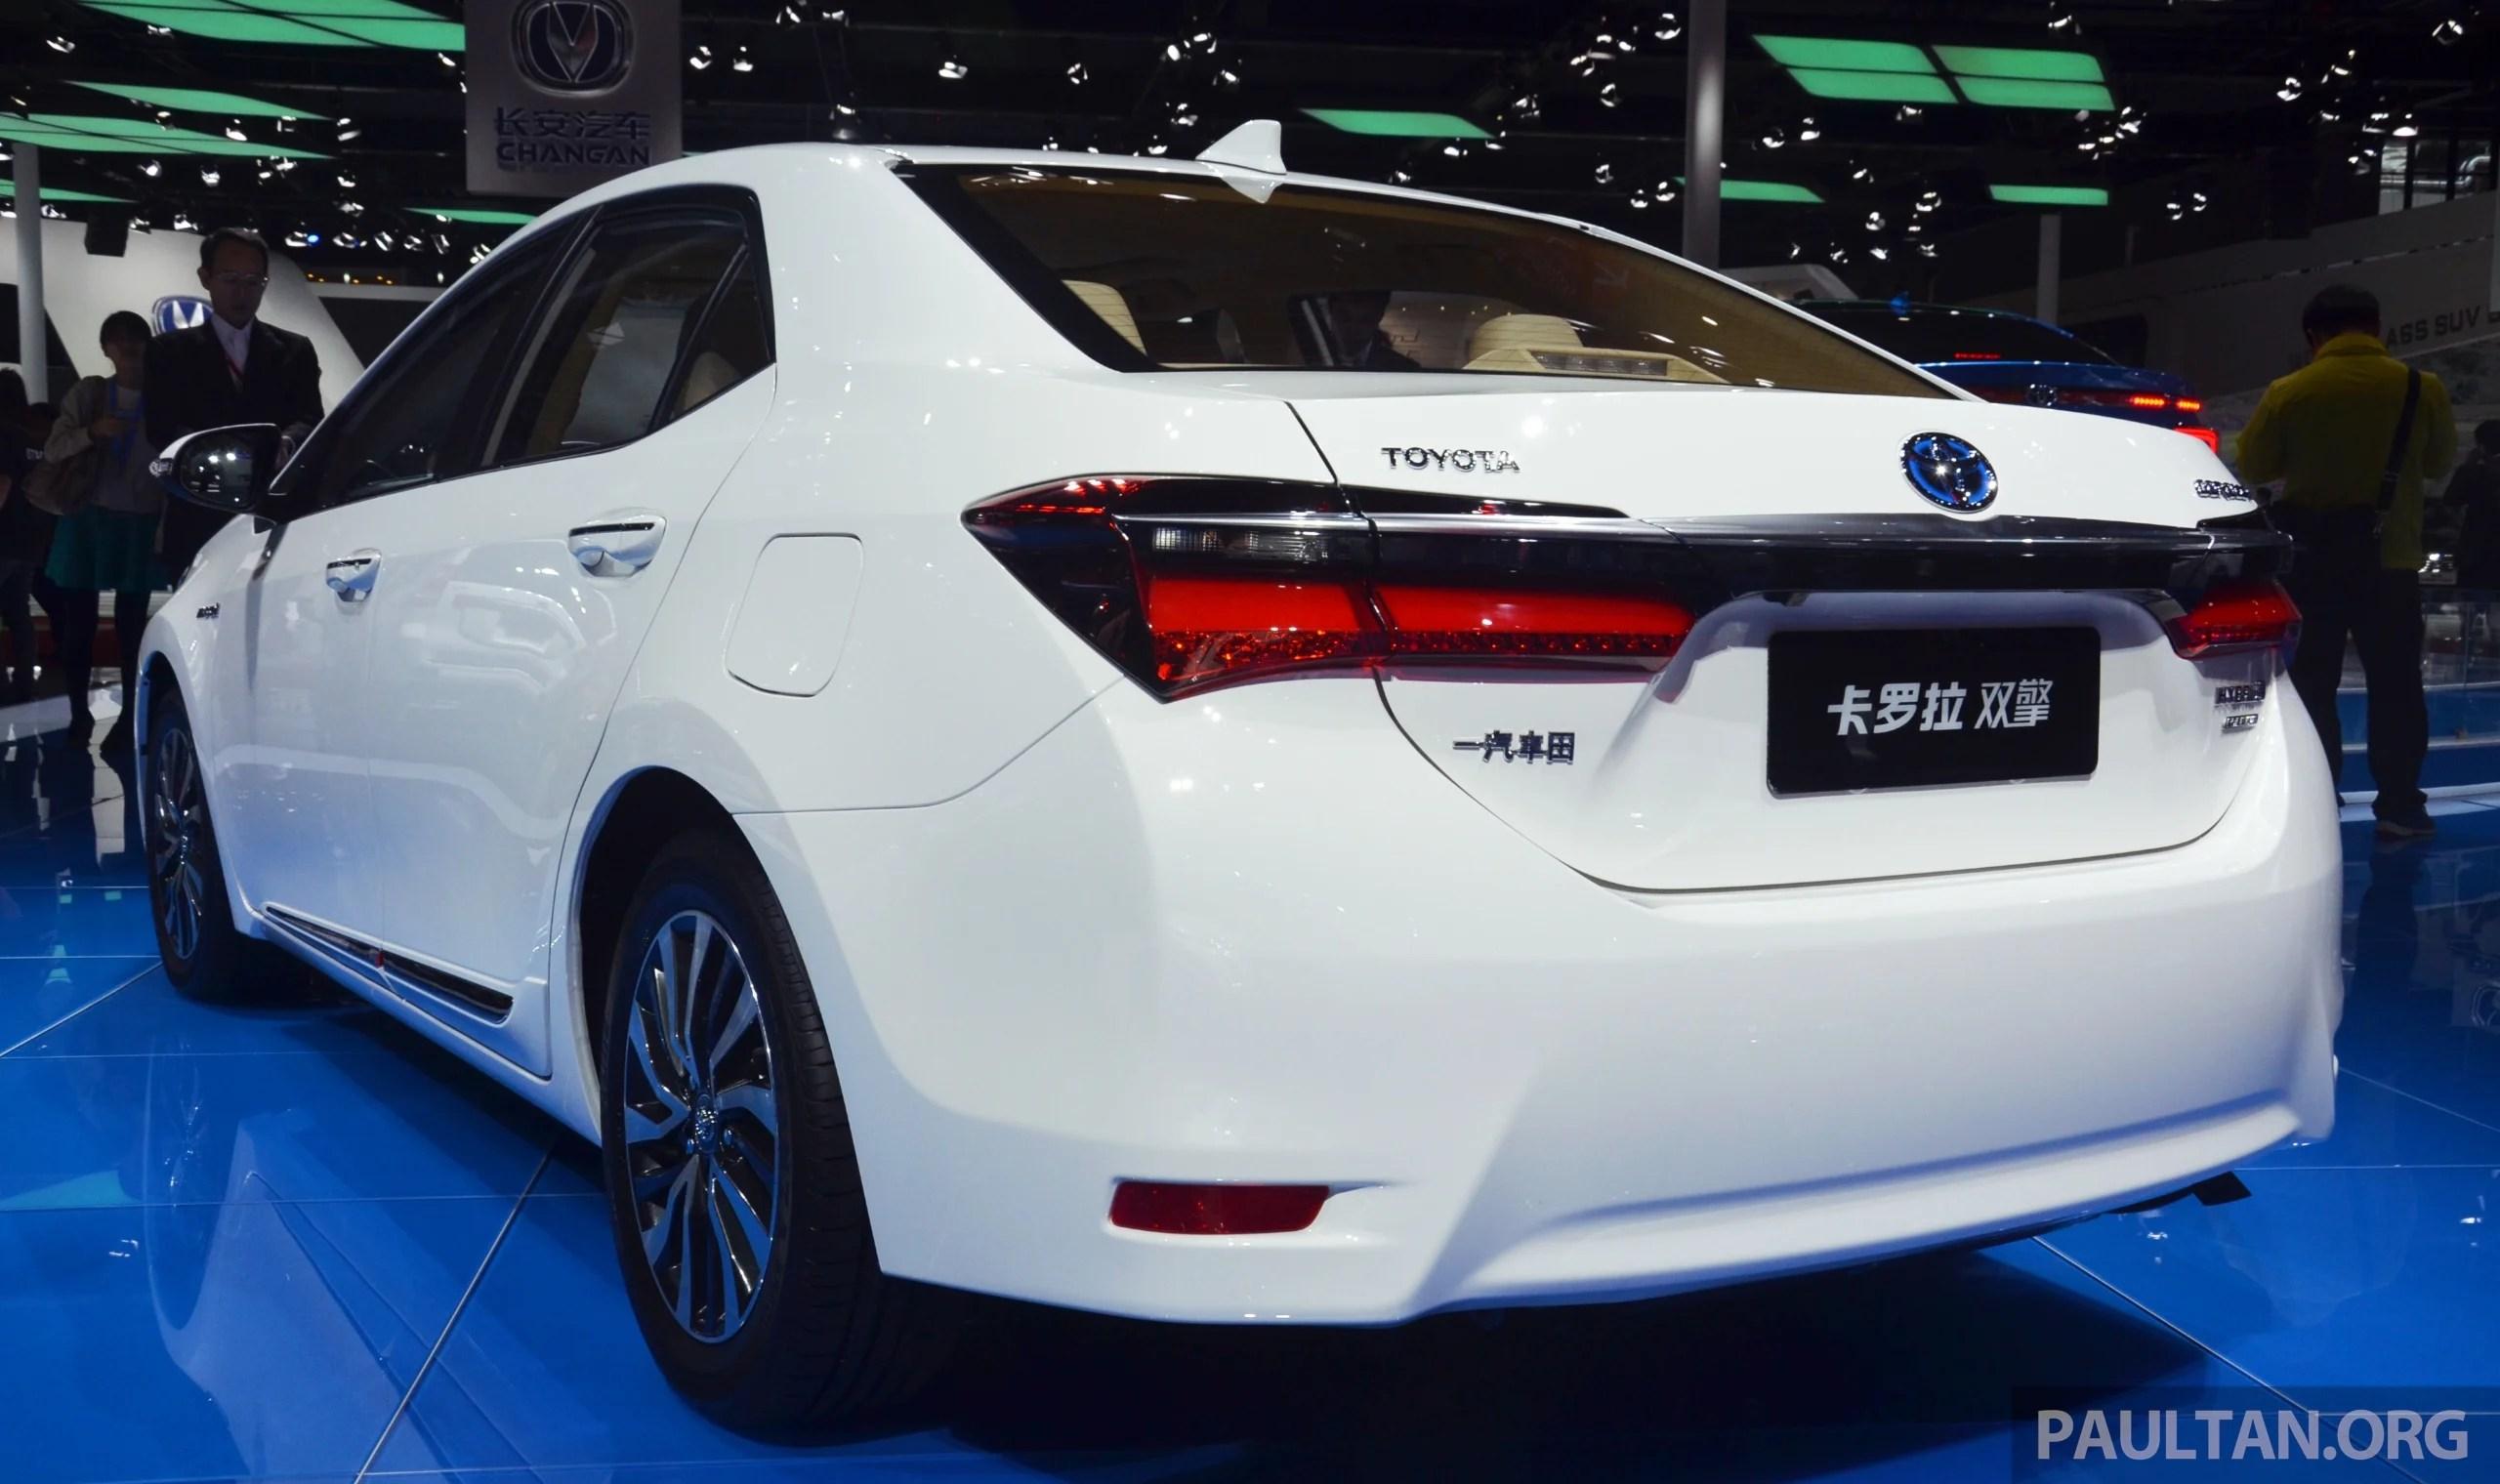 all new corolla altis 2018 kijang innova 2.4 v a/t diesel shanghai 2015 toyota hybrid levin hev debut paul